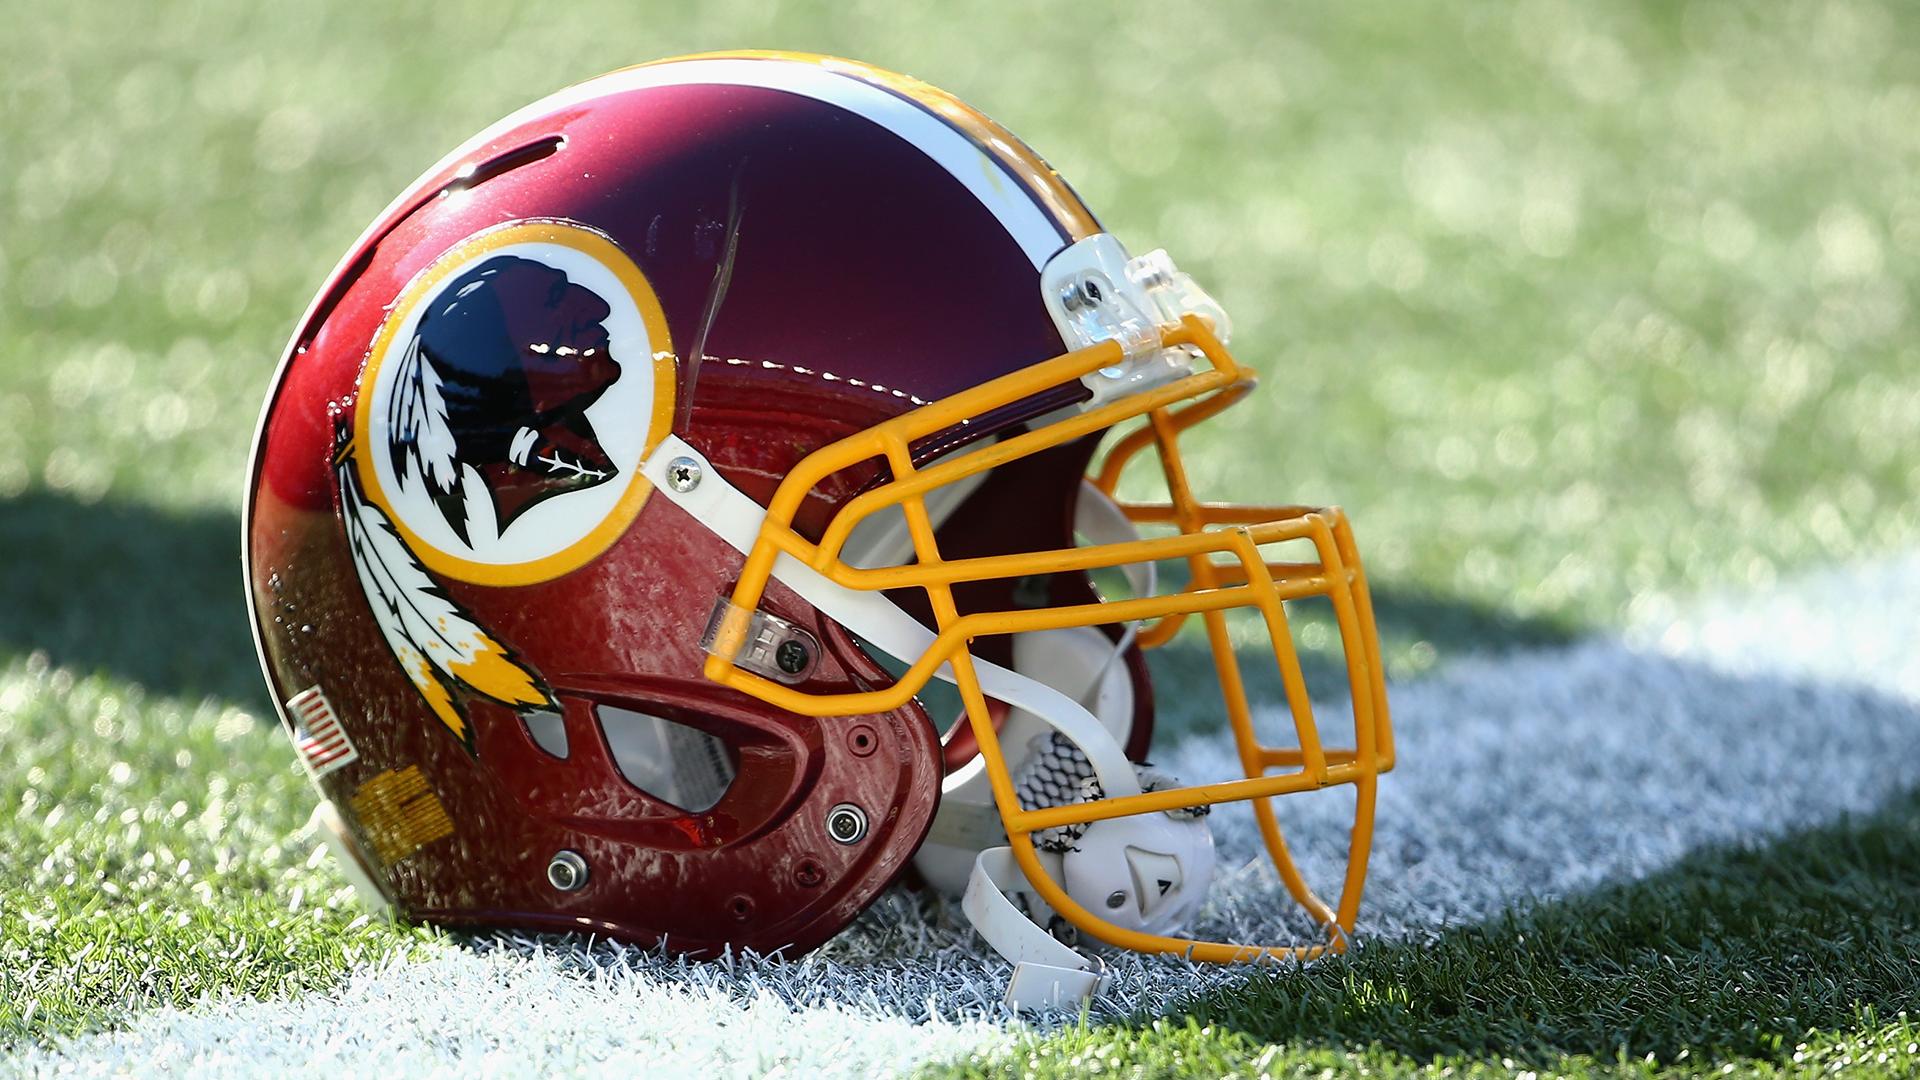 The Washington football team will call itself the 'Washington Football Team' until new name arrives